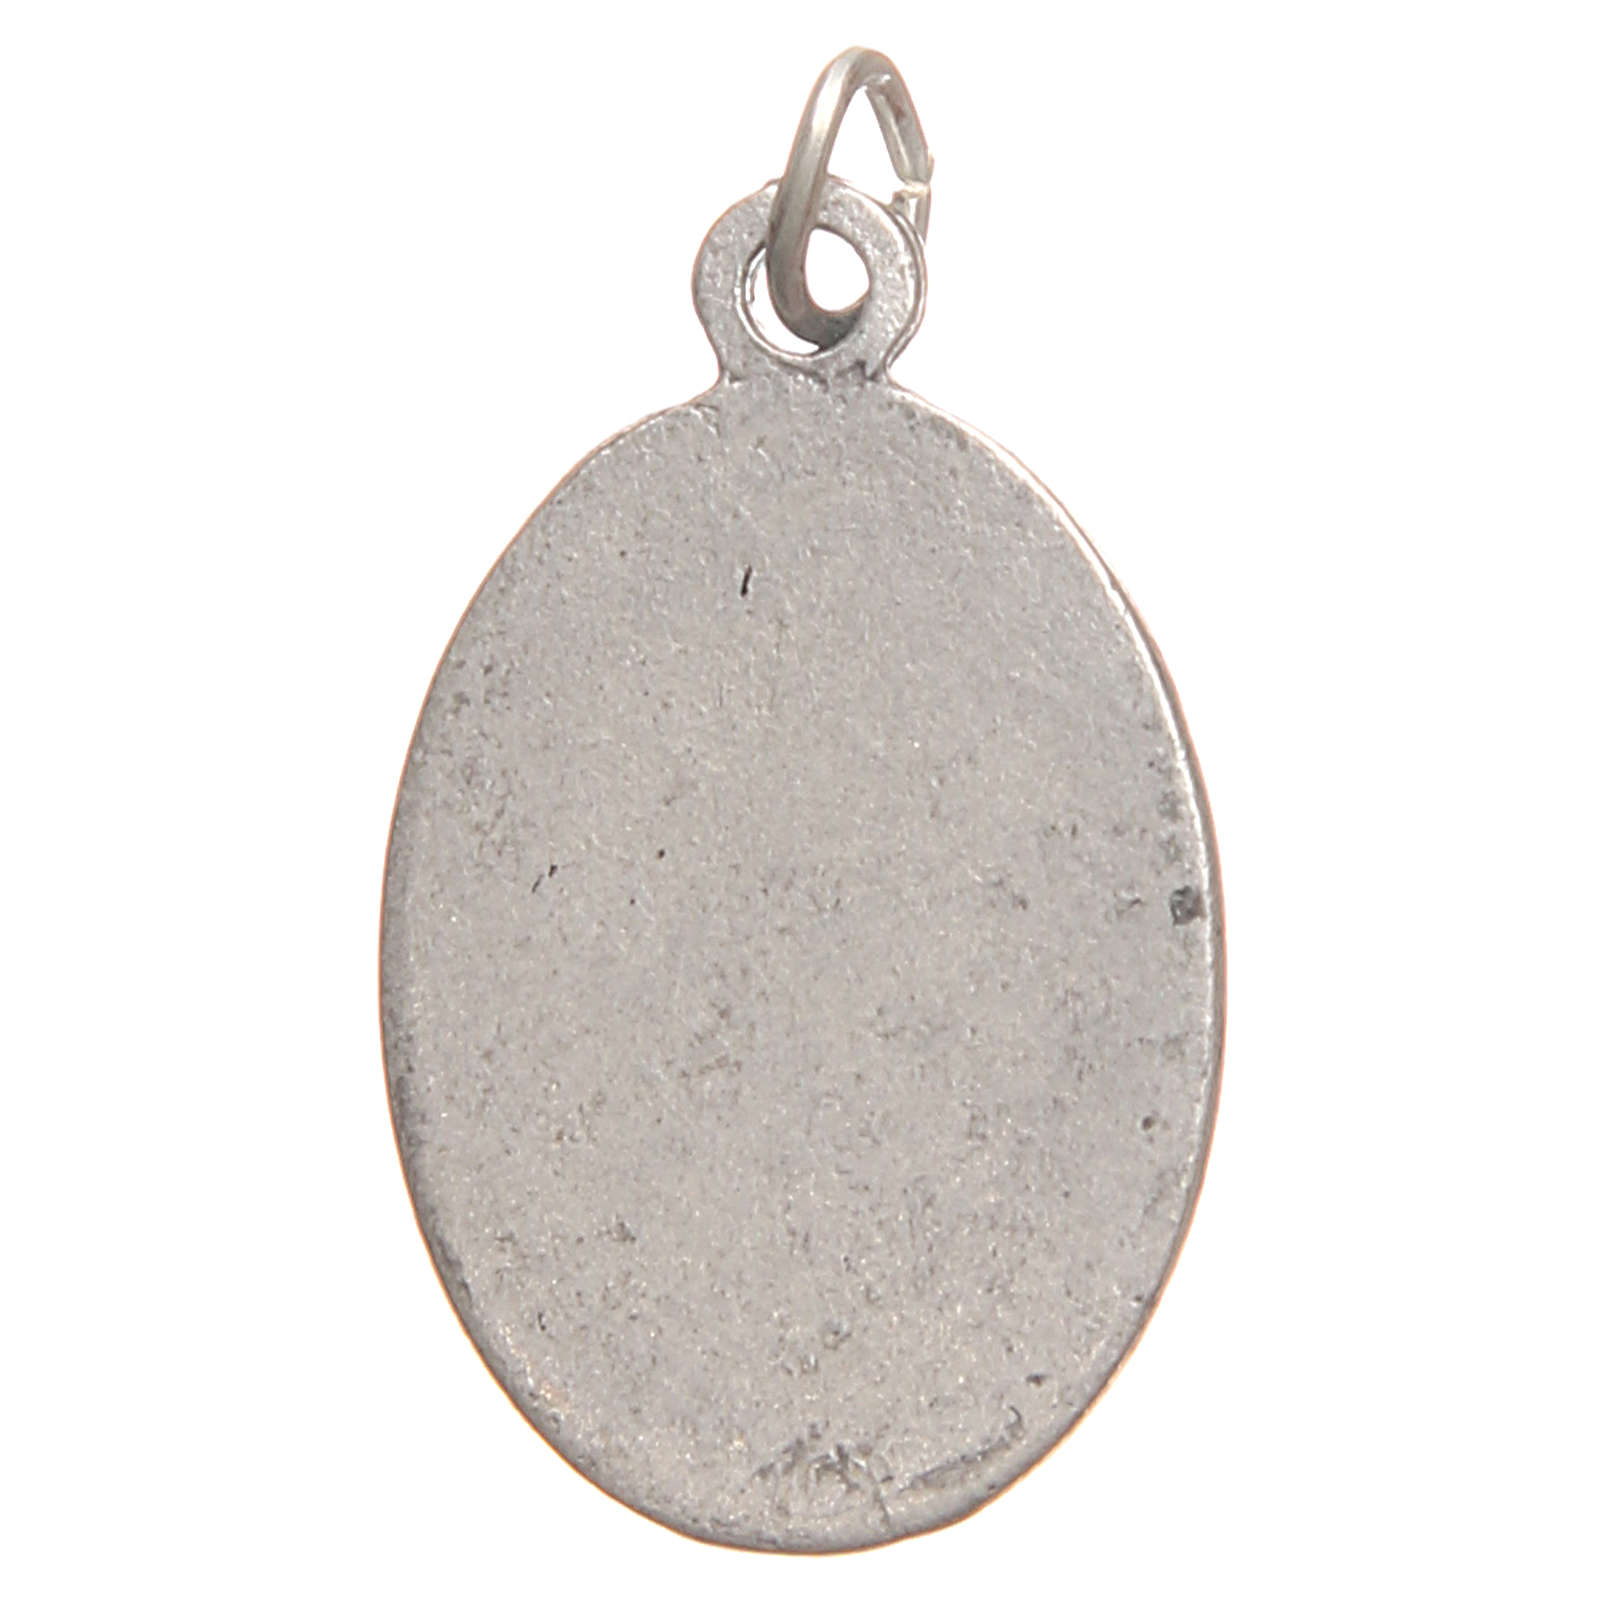 Medalla Santa Faustina galvánica plata antigua plata 2,1 cm 4